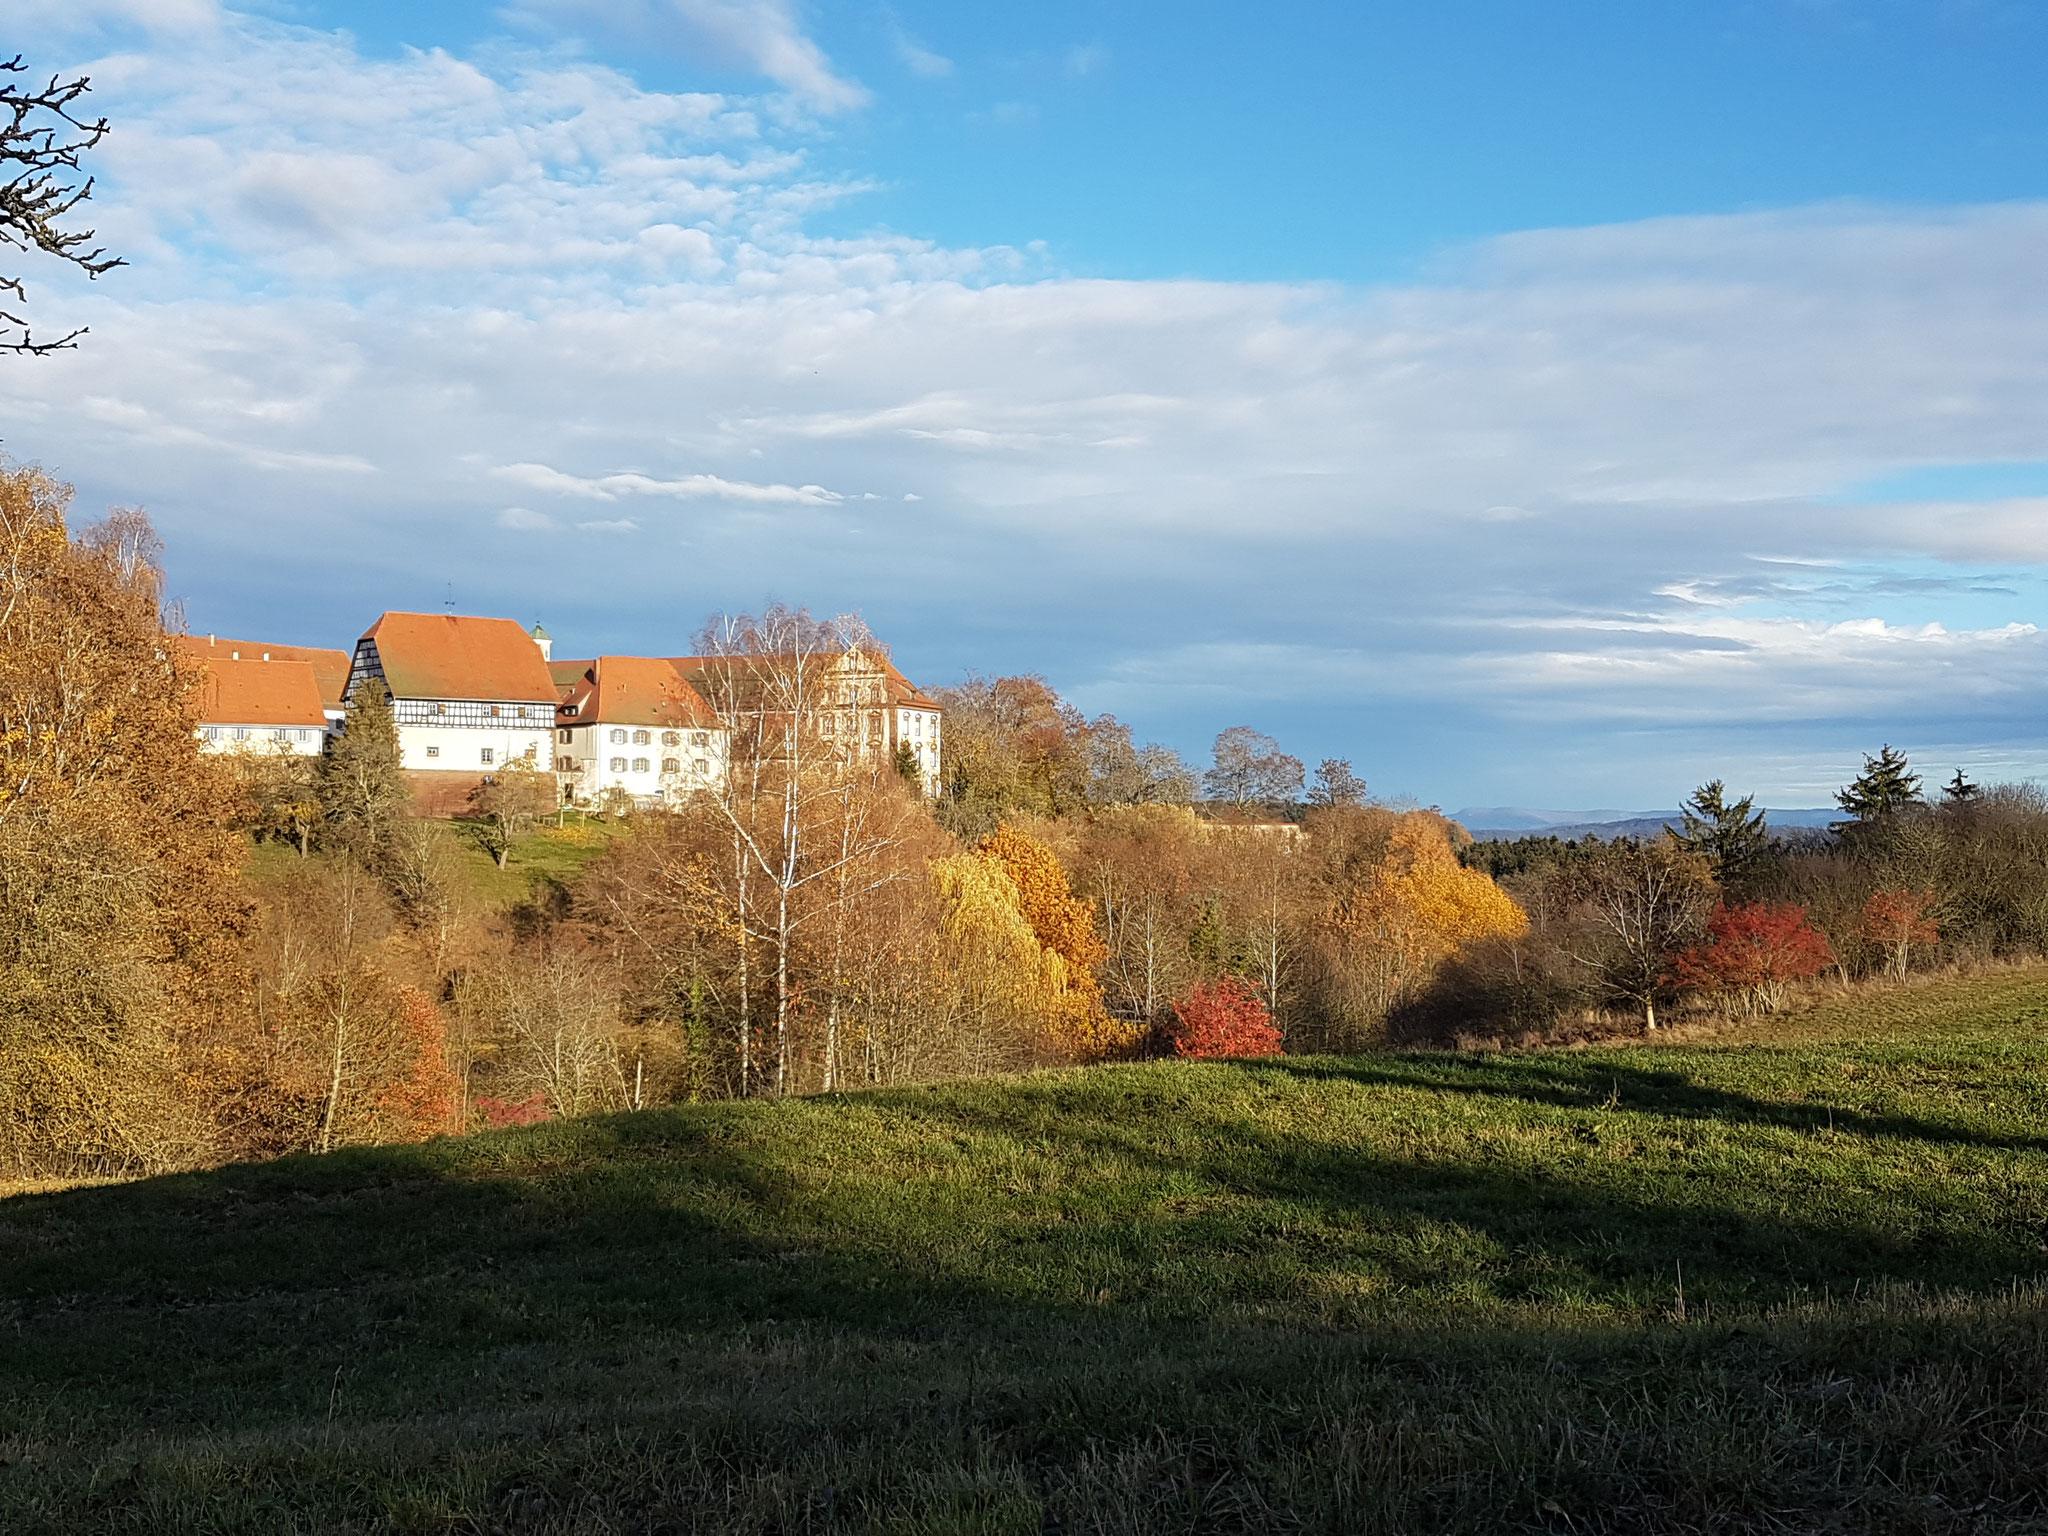 Kloster Kirchberg in Haigerloch